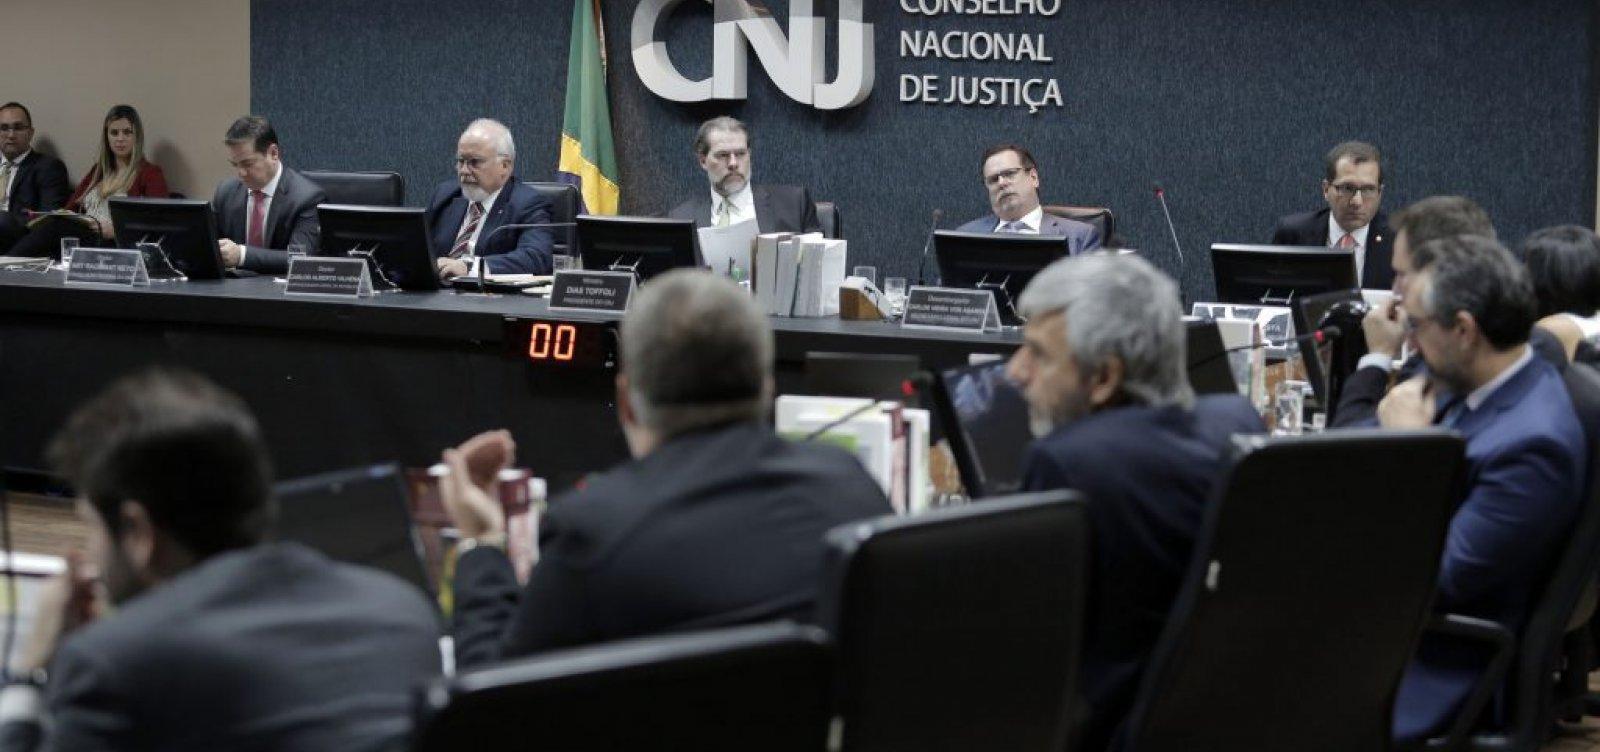 [CNJ abre processo contra juiz que acusou Gilmar Mendes de receber propina]